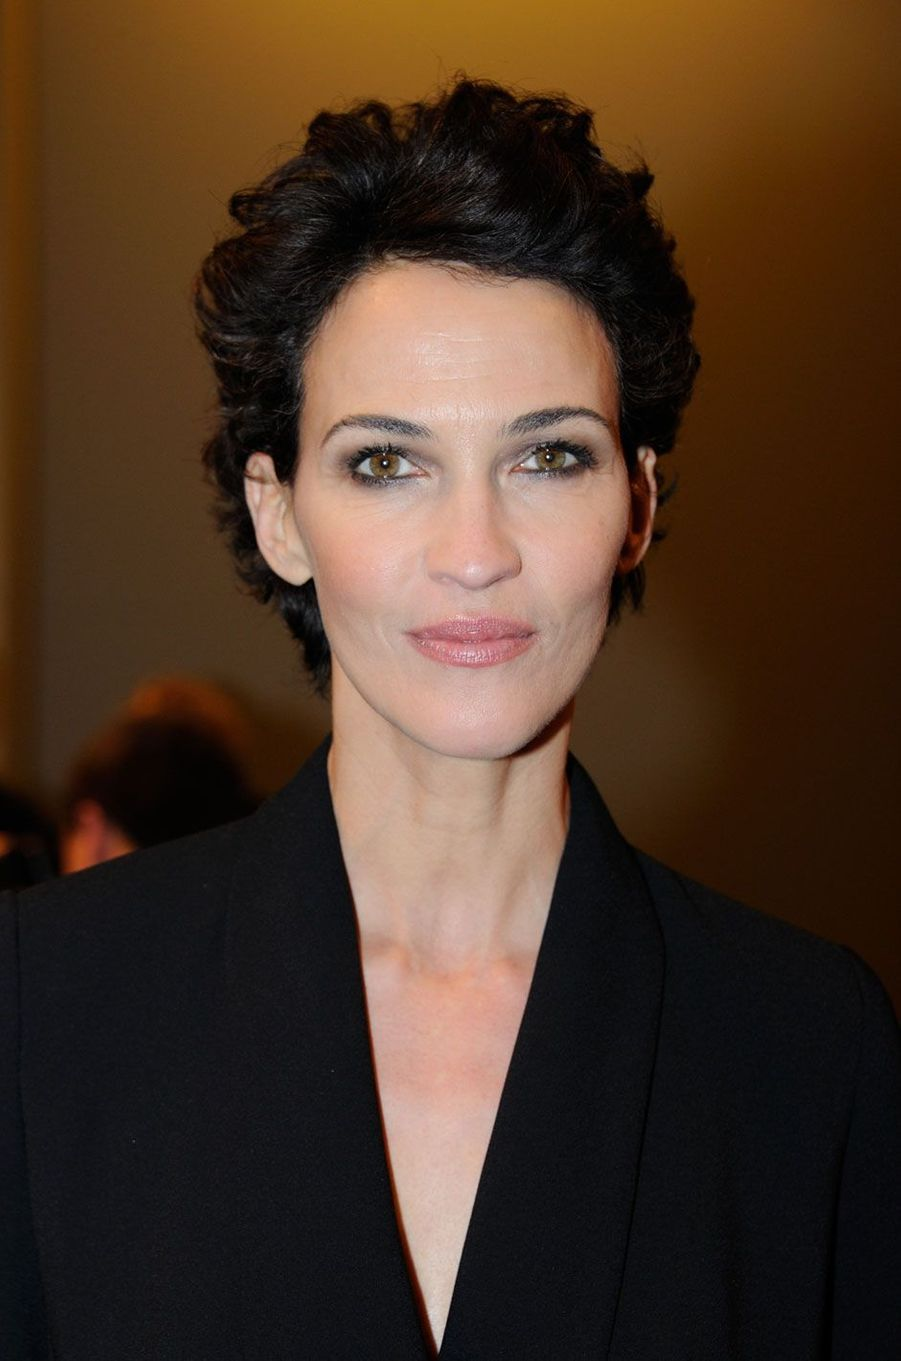 Linda Hardy, Miss France 1992